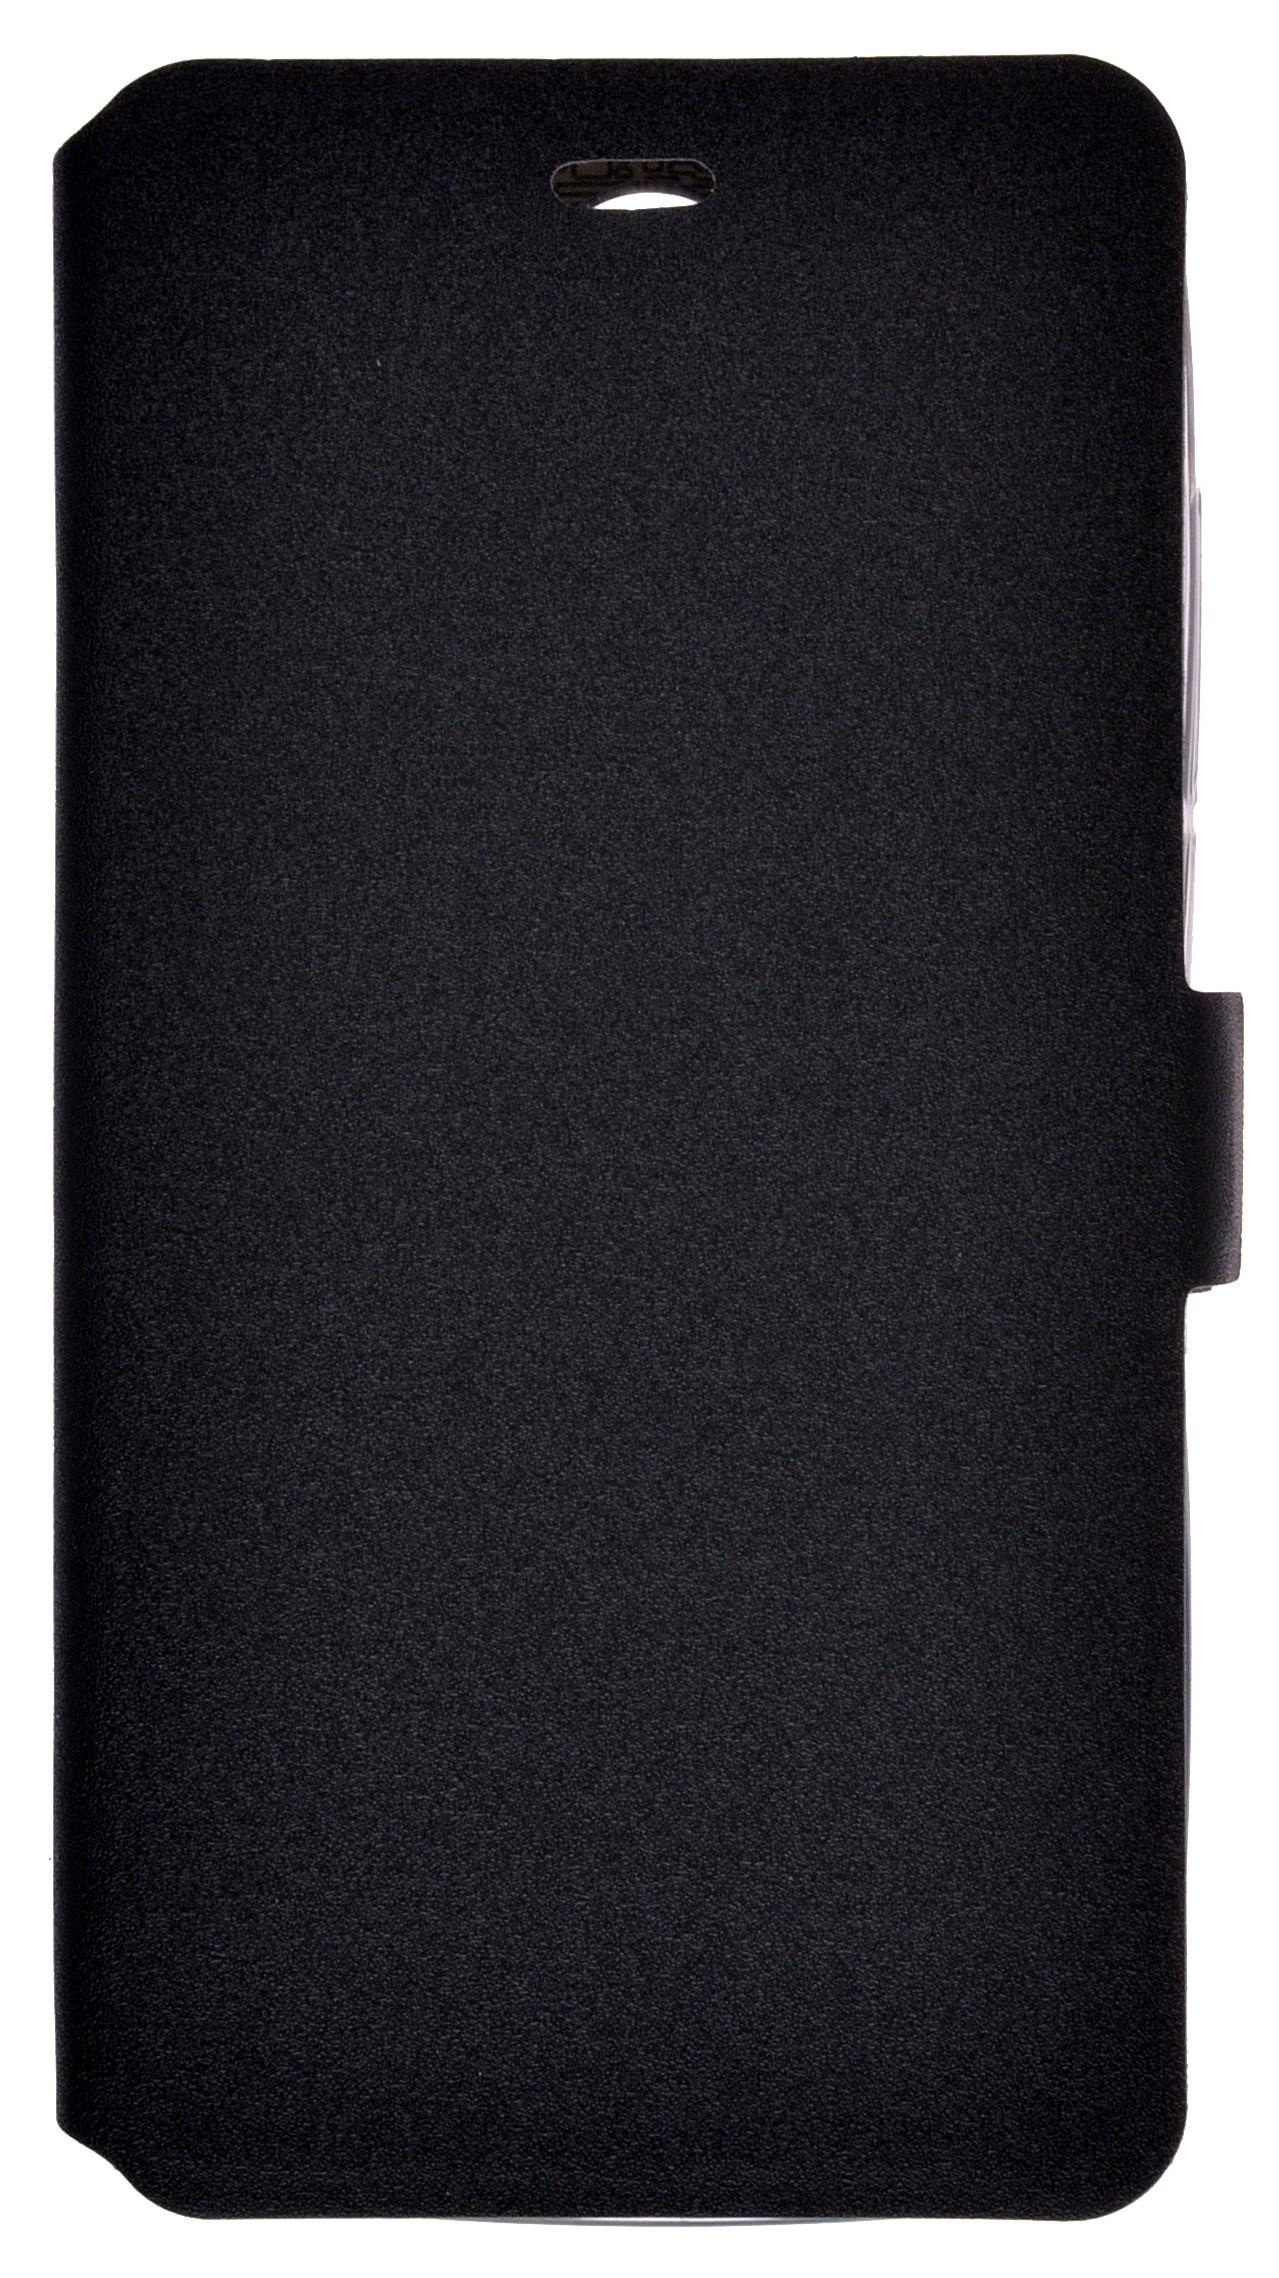 Чехол Prime Book- для Prestigio Muze G3 аккумулятор для телефона ibatt bl 53yh для lg d855 g3 d690 d690 g3 stylus d851 g3 d850 g3 d856 lg g3 dual lte vs985 g3 ls990 g3 d690n f400 g3 aka